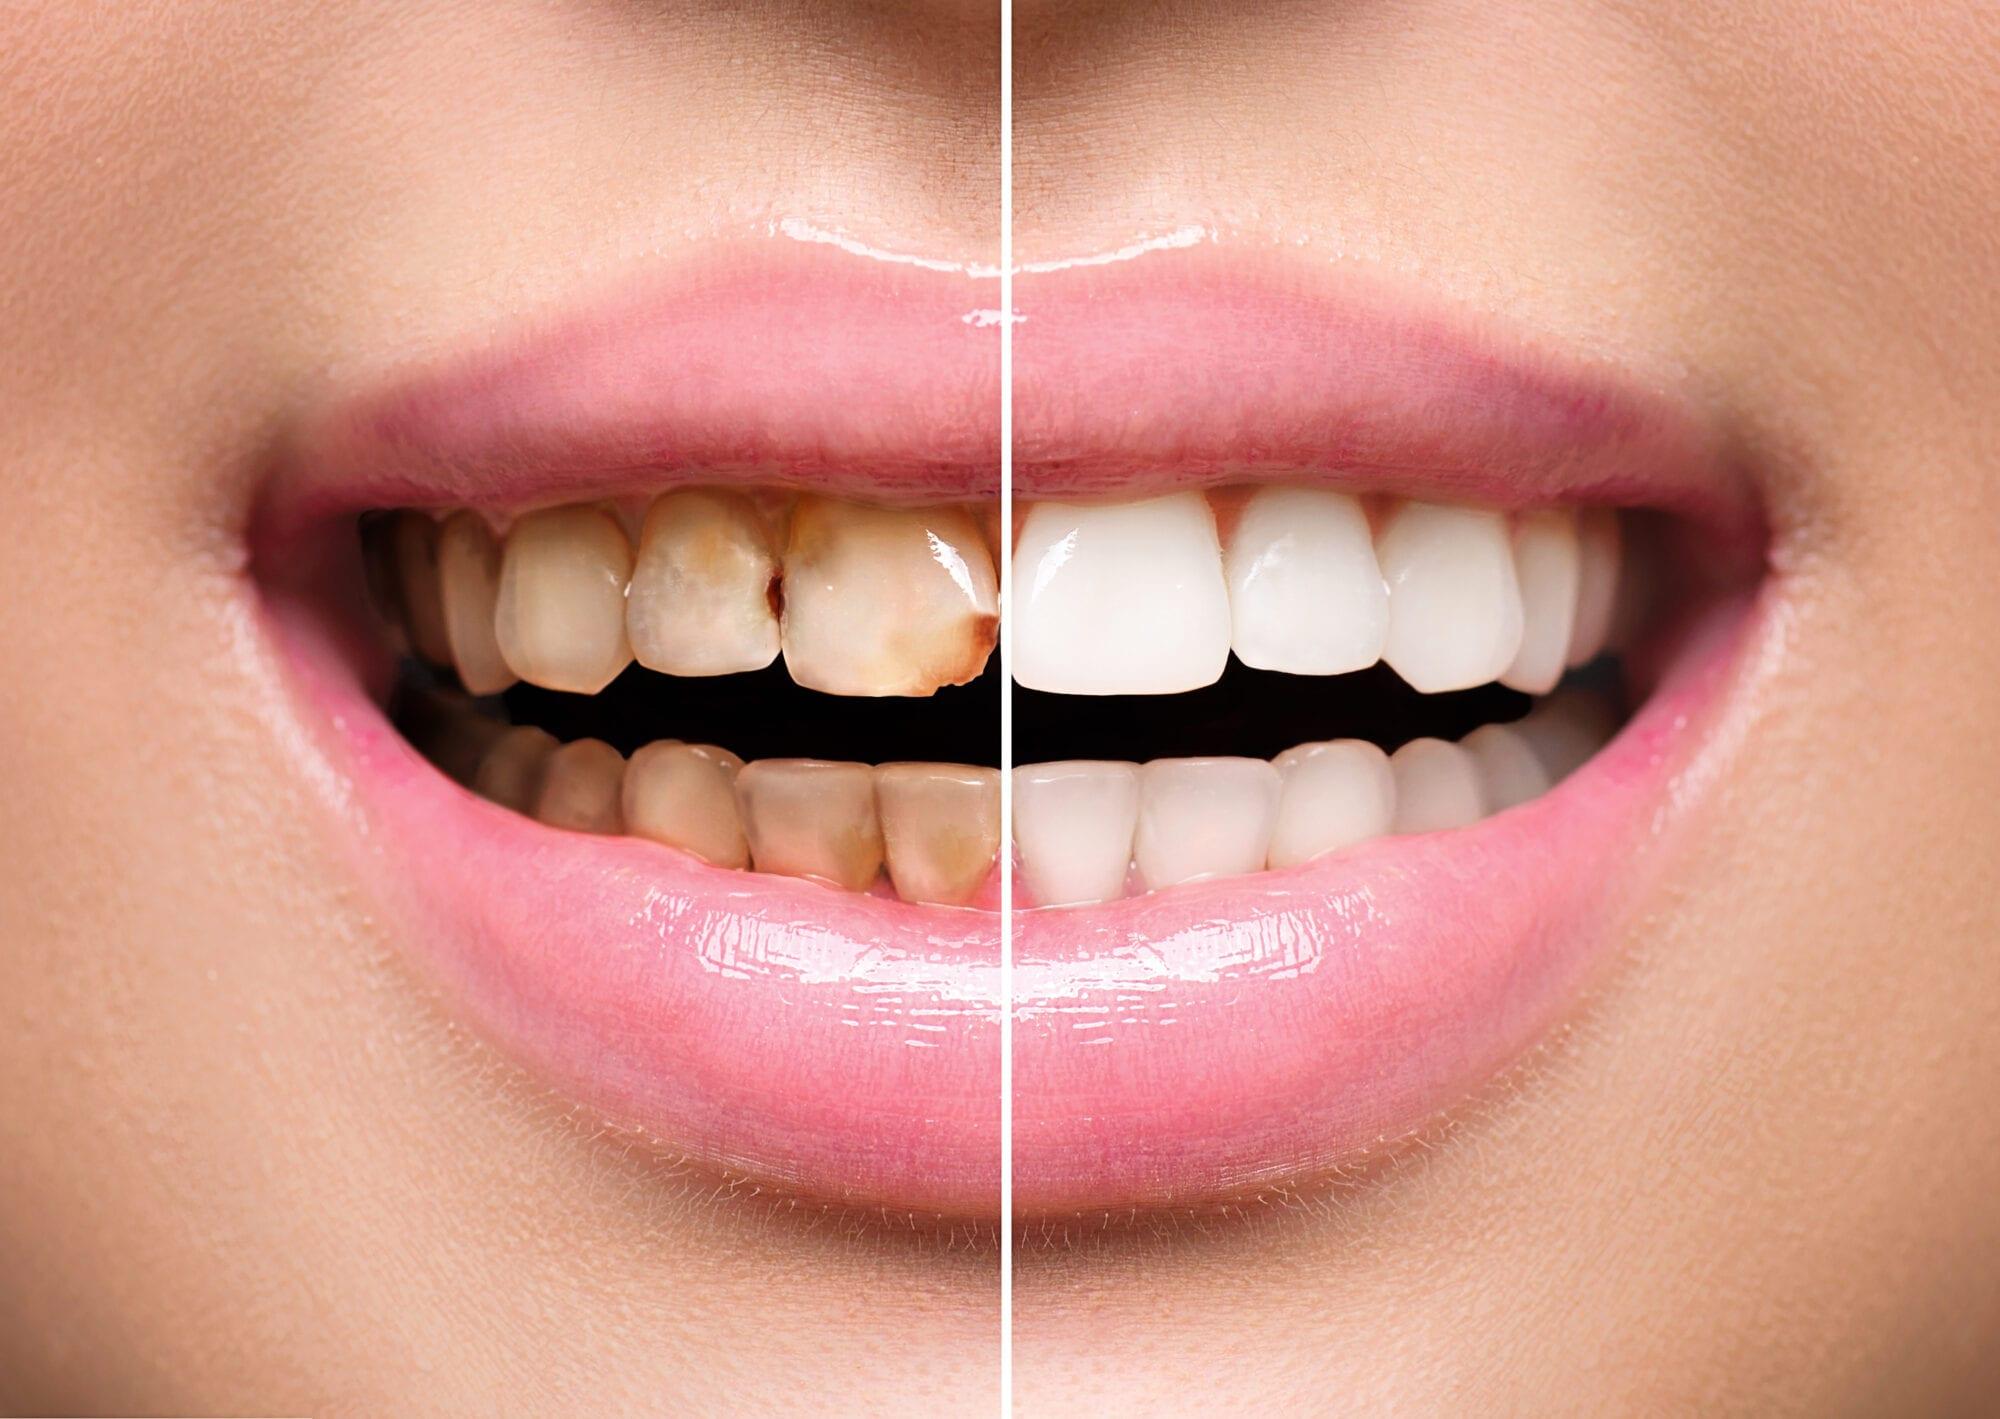 Teeth Whitening at 32 Pearls Seattle Dentist